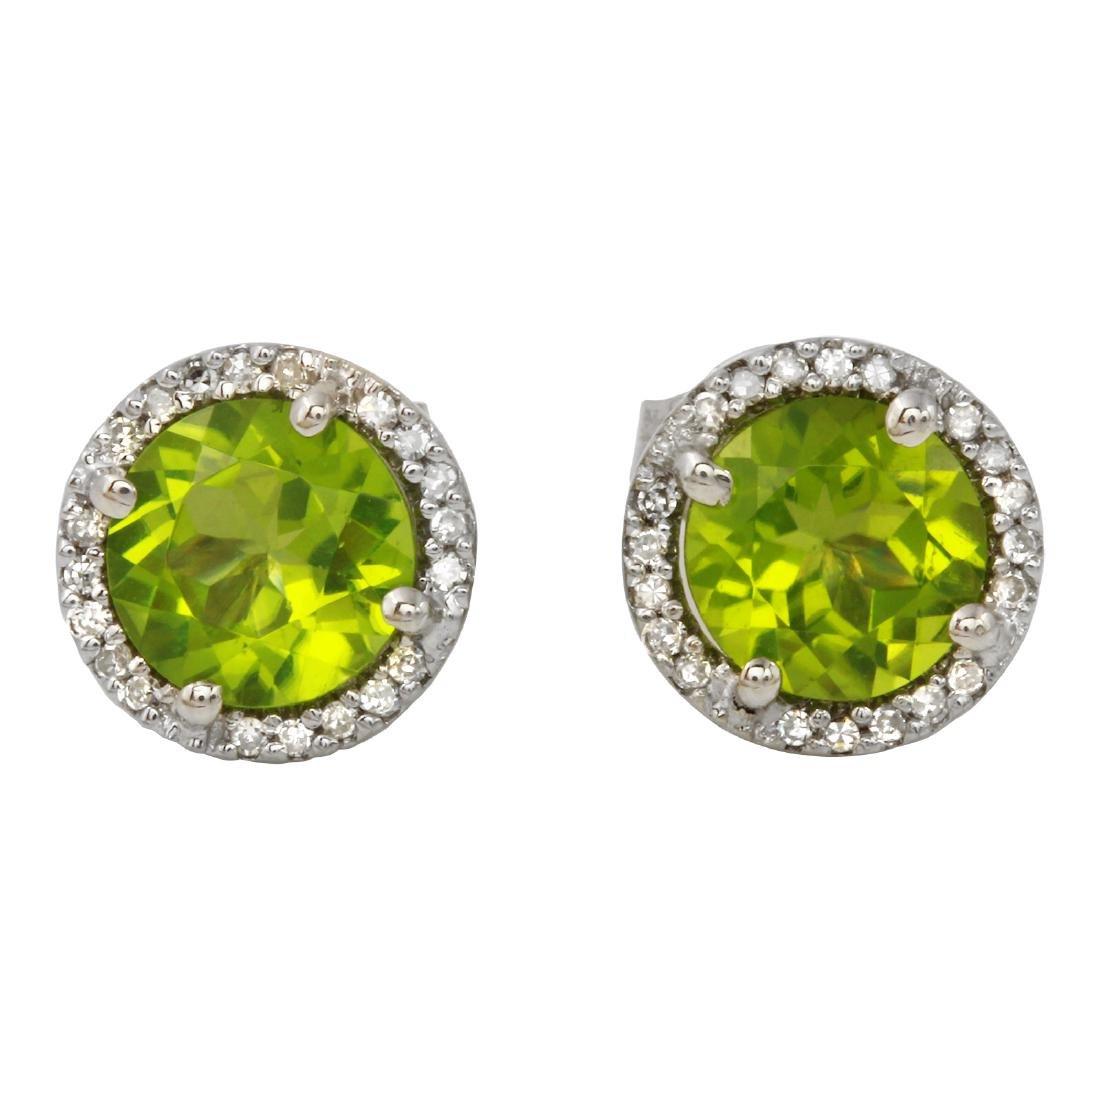 14KT White Gold 3.10ctw Peridot and Diamond Earrings